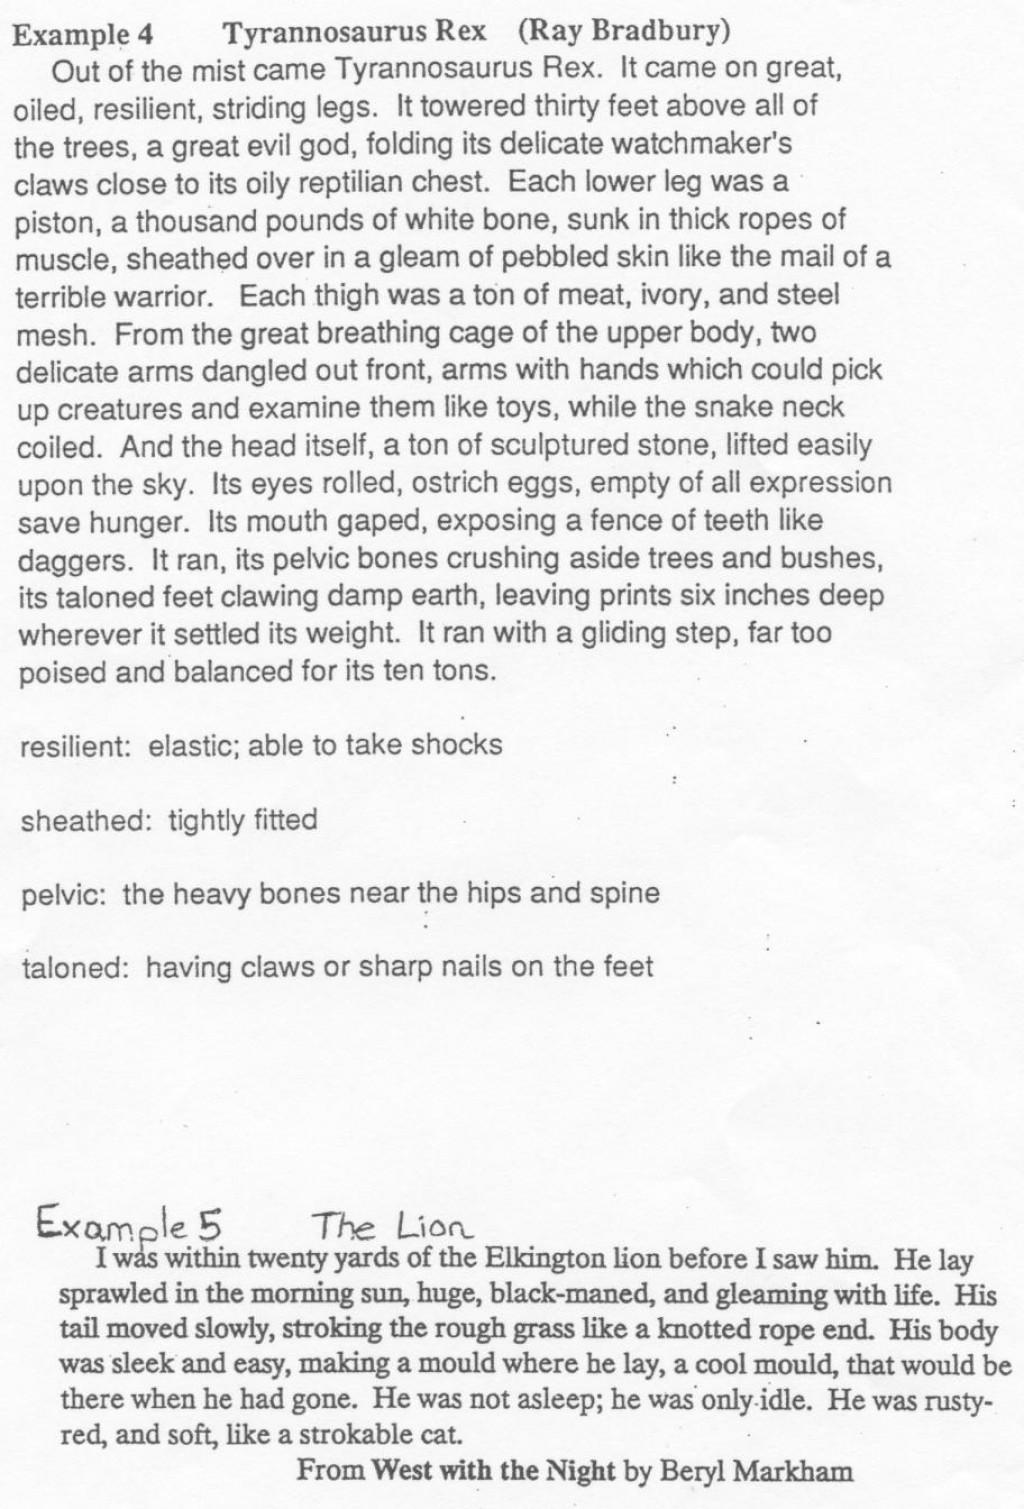 013 Descriptive Narrative Essayss Of Paragraphs And Chart 001 Remarkable Essay Examples Topics Good Large